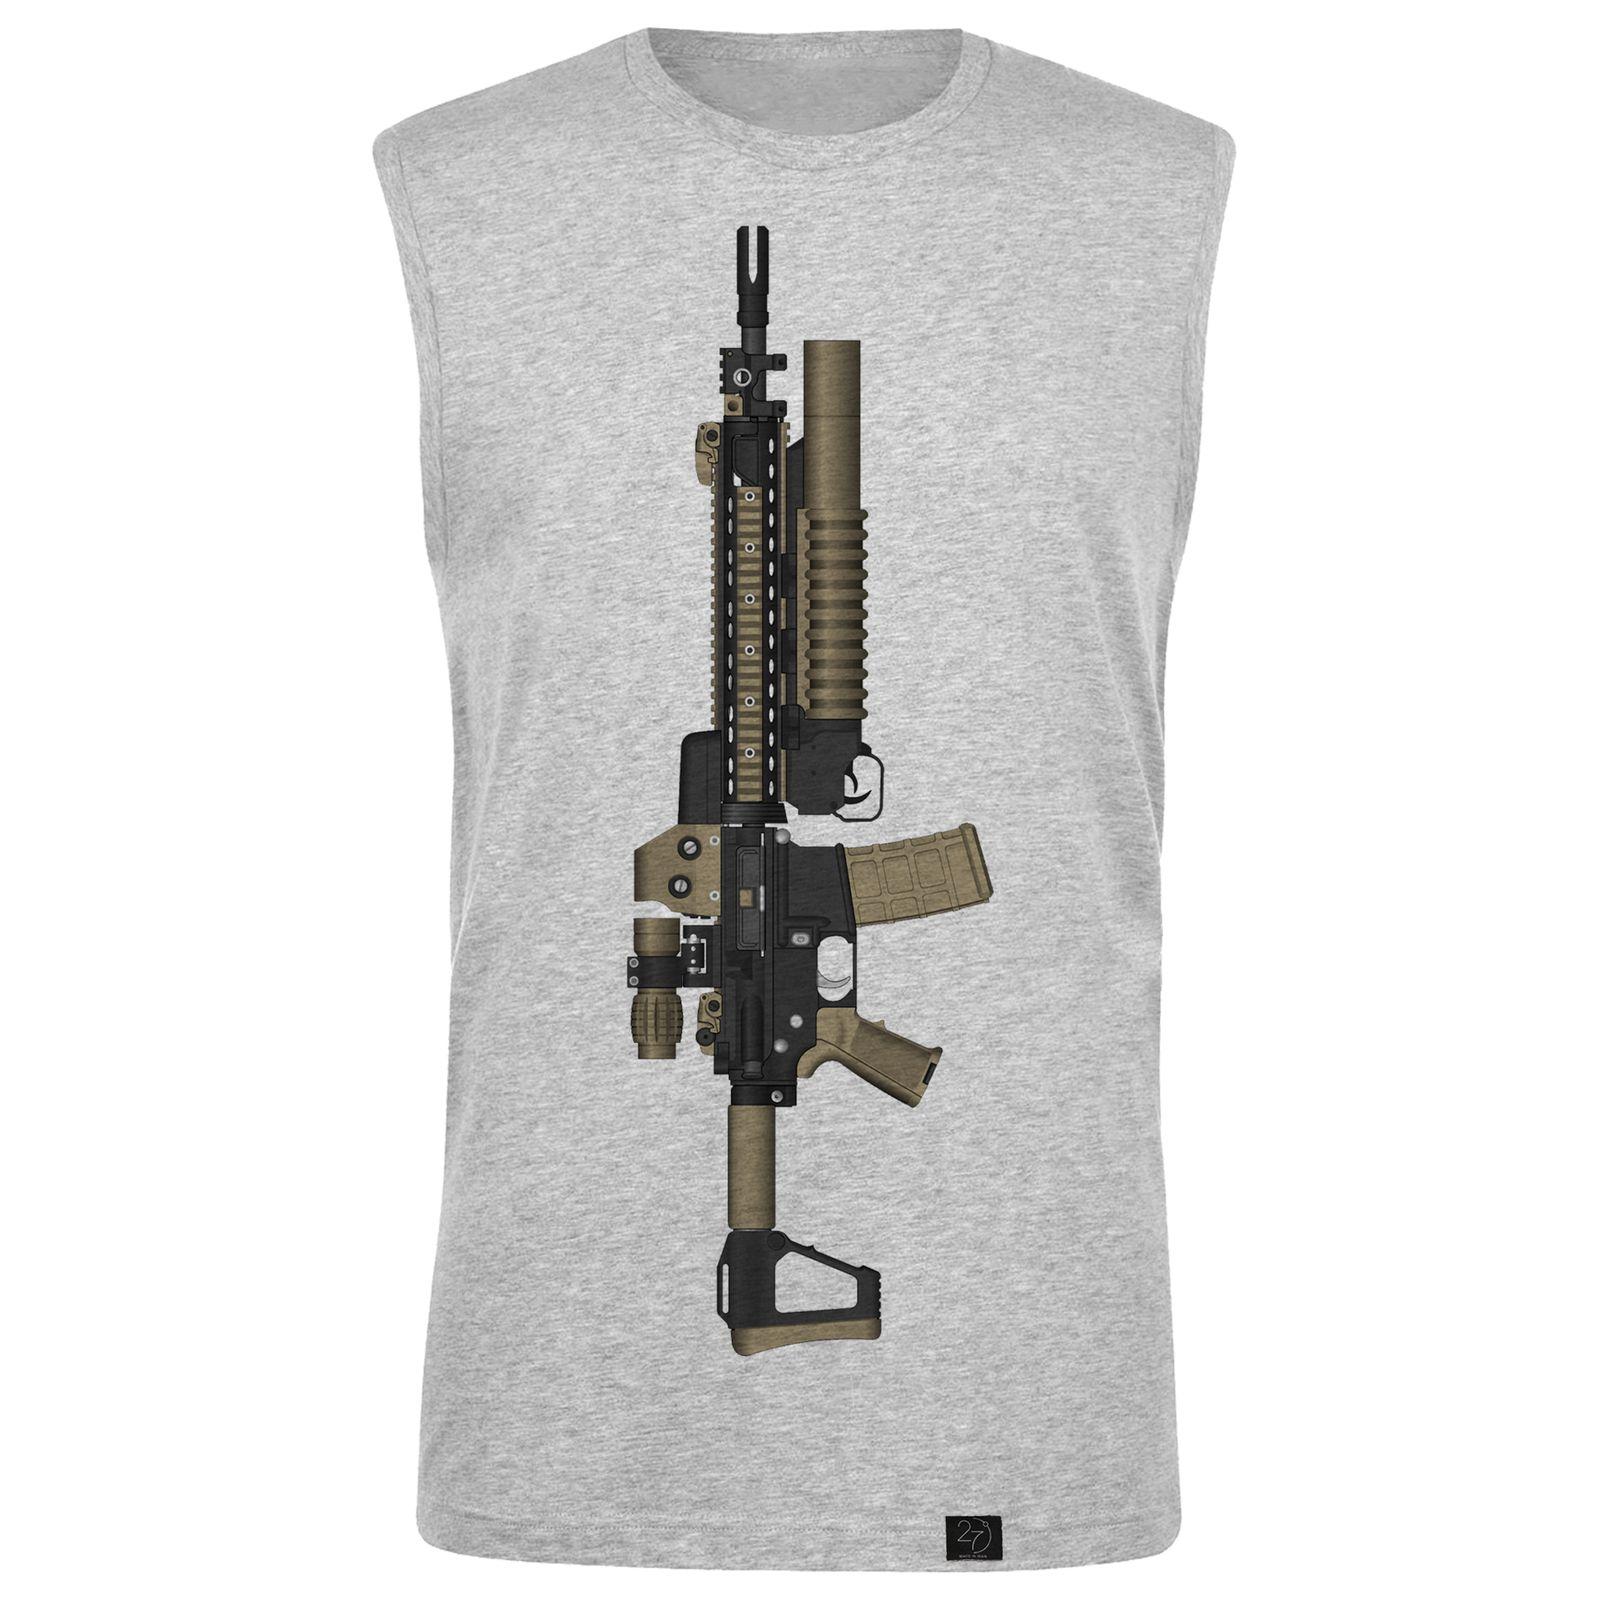 ست تاپ و شلوارک مردانه 27 طرح gun کد H16 -  - 2